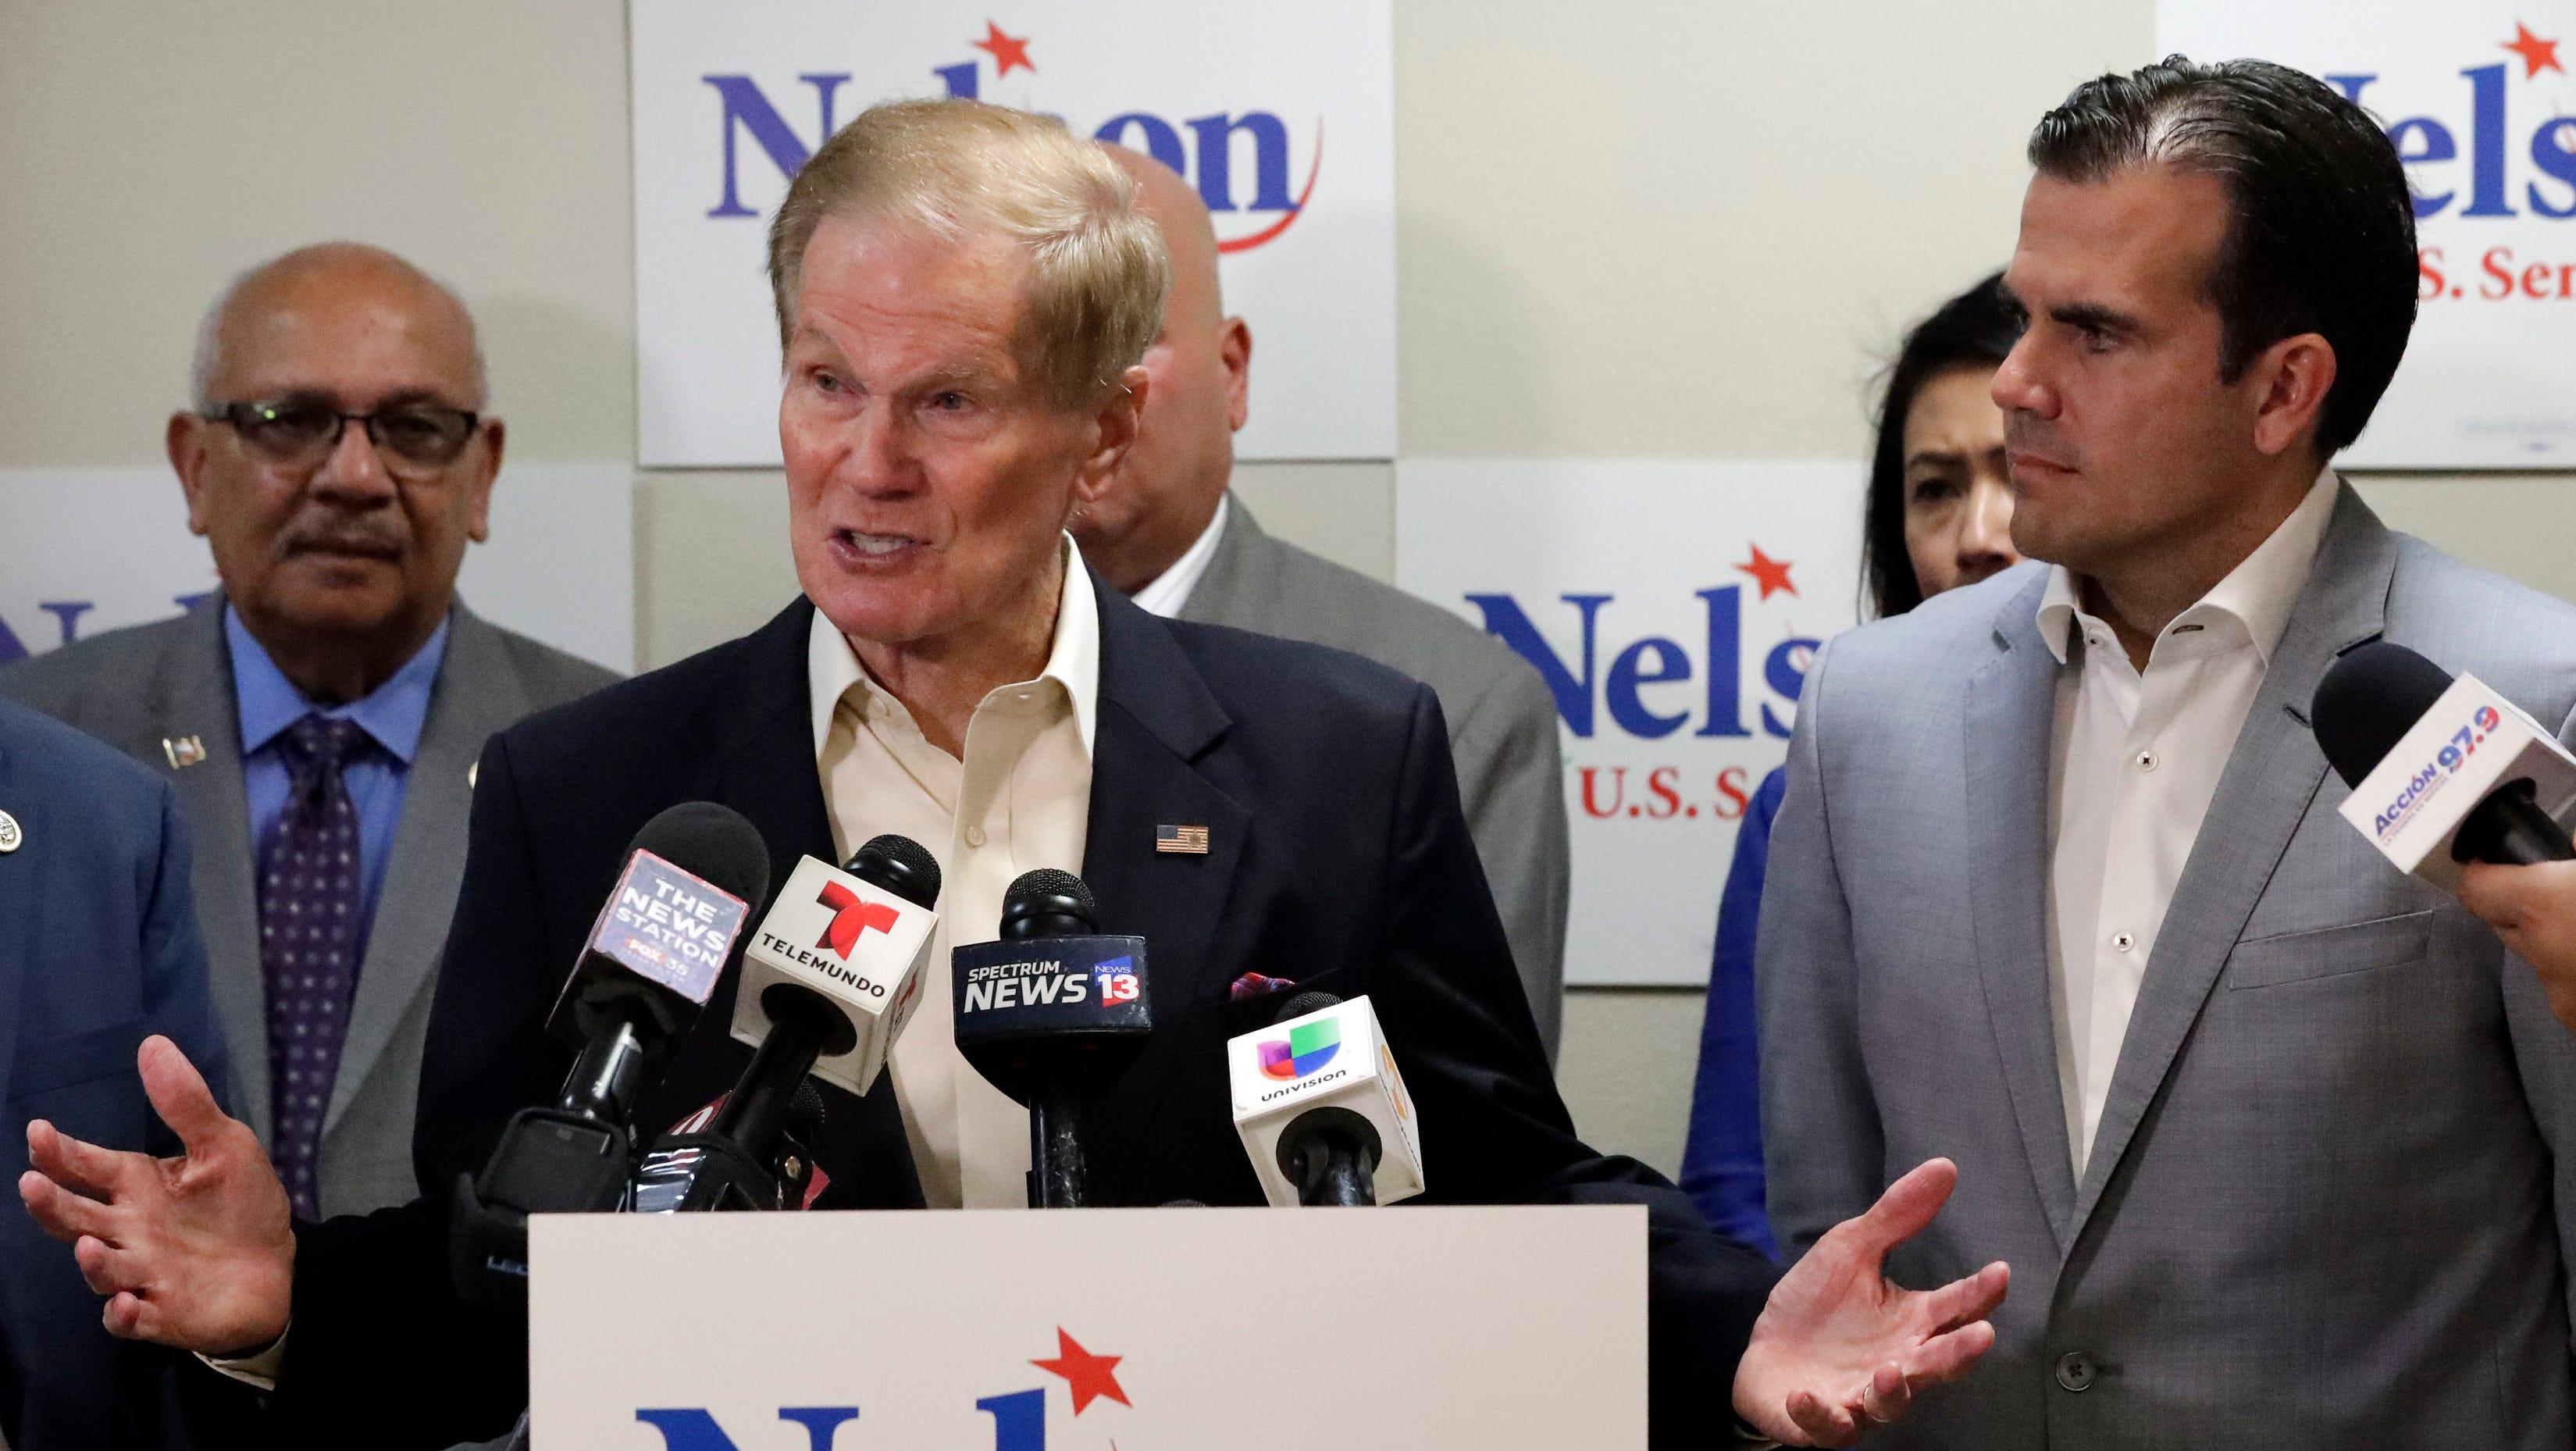 Sen. Bill Nelson and Donald Trump: 10 key votes the Florida Democrat cast in the Trump era